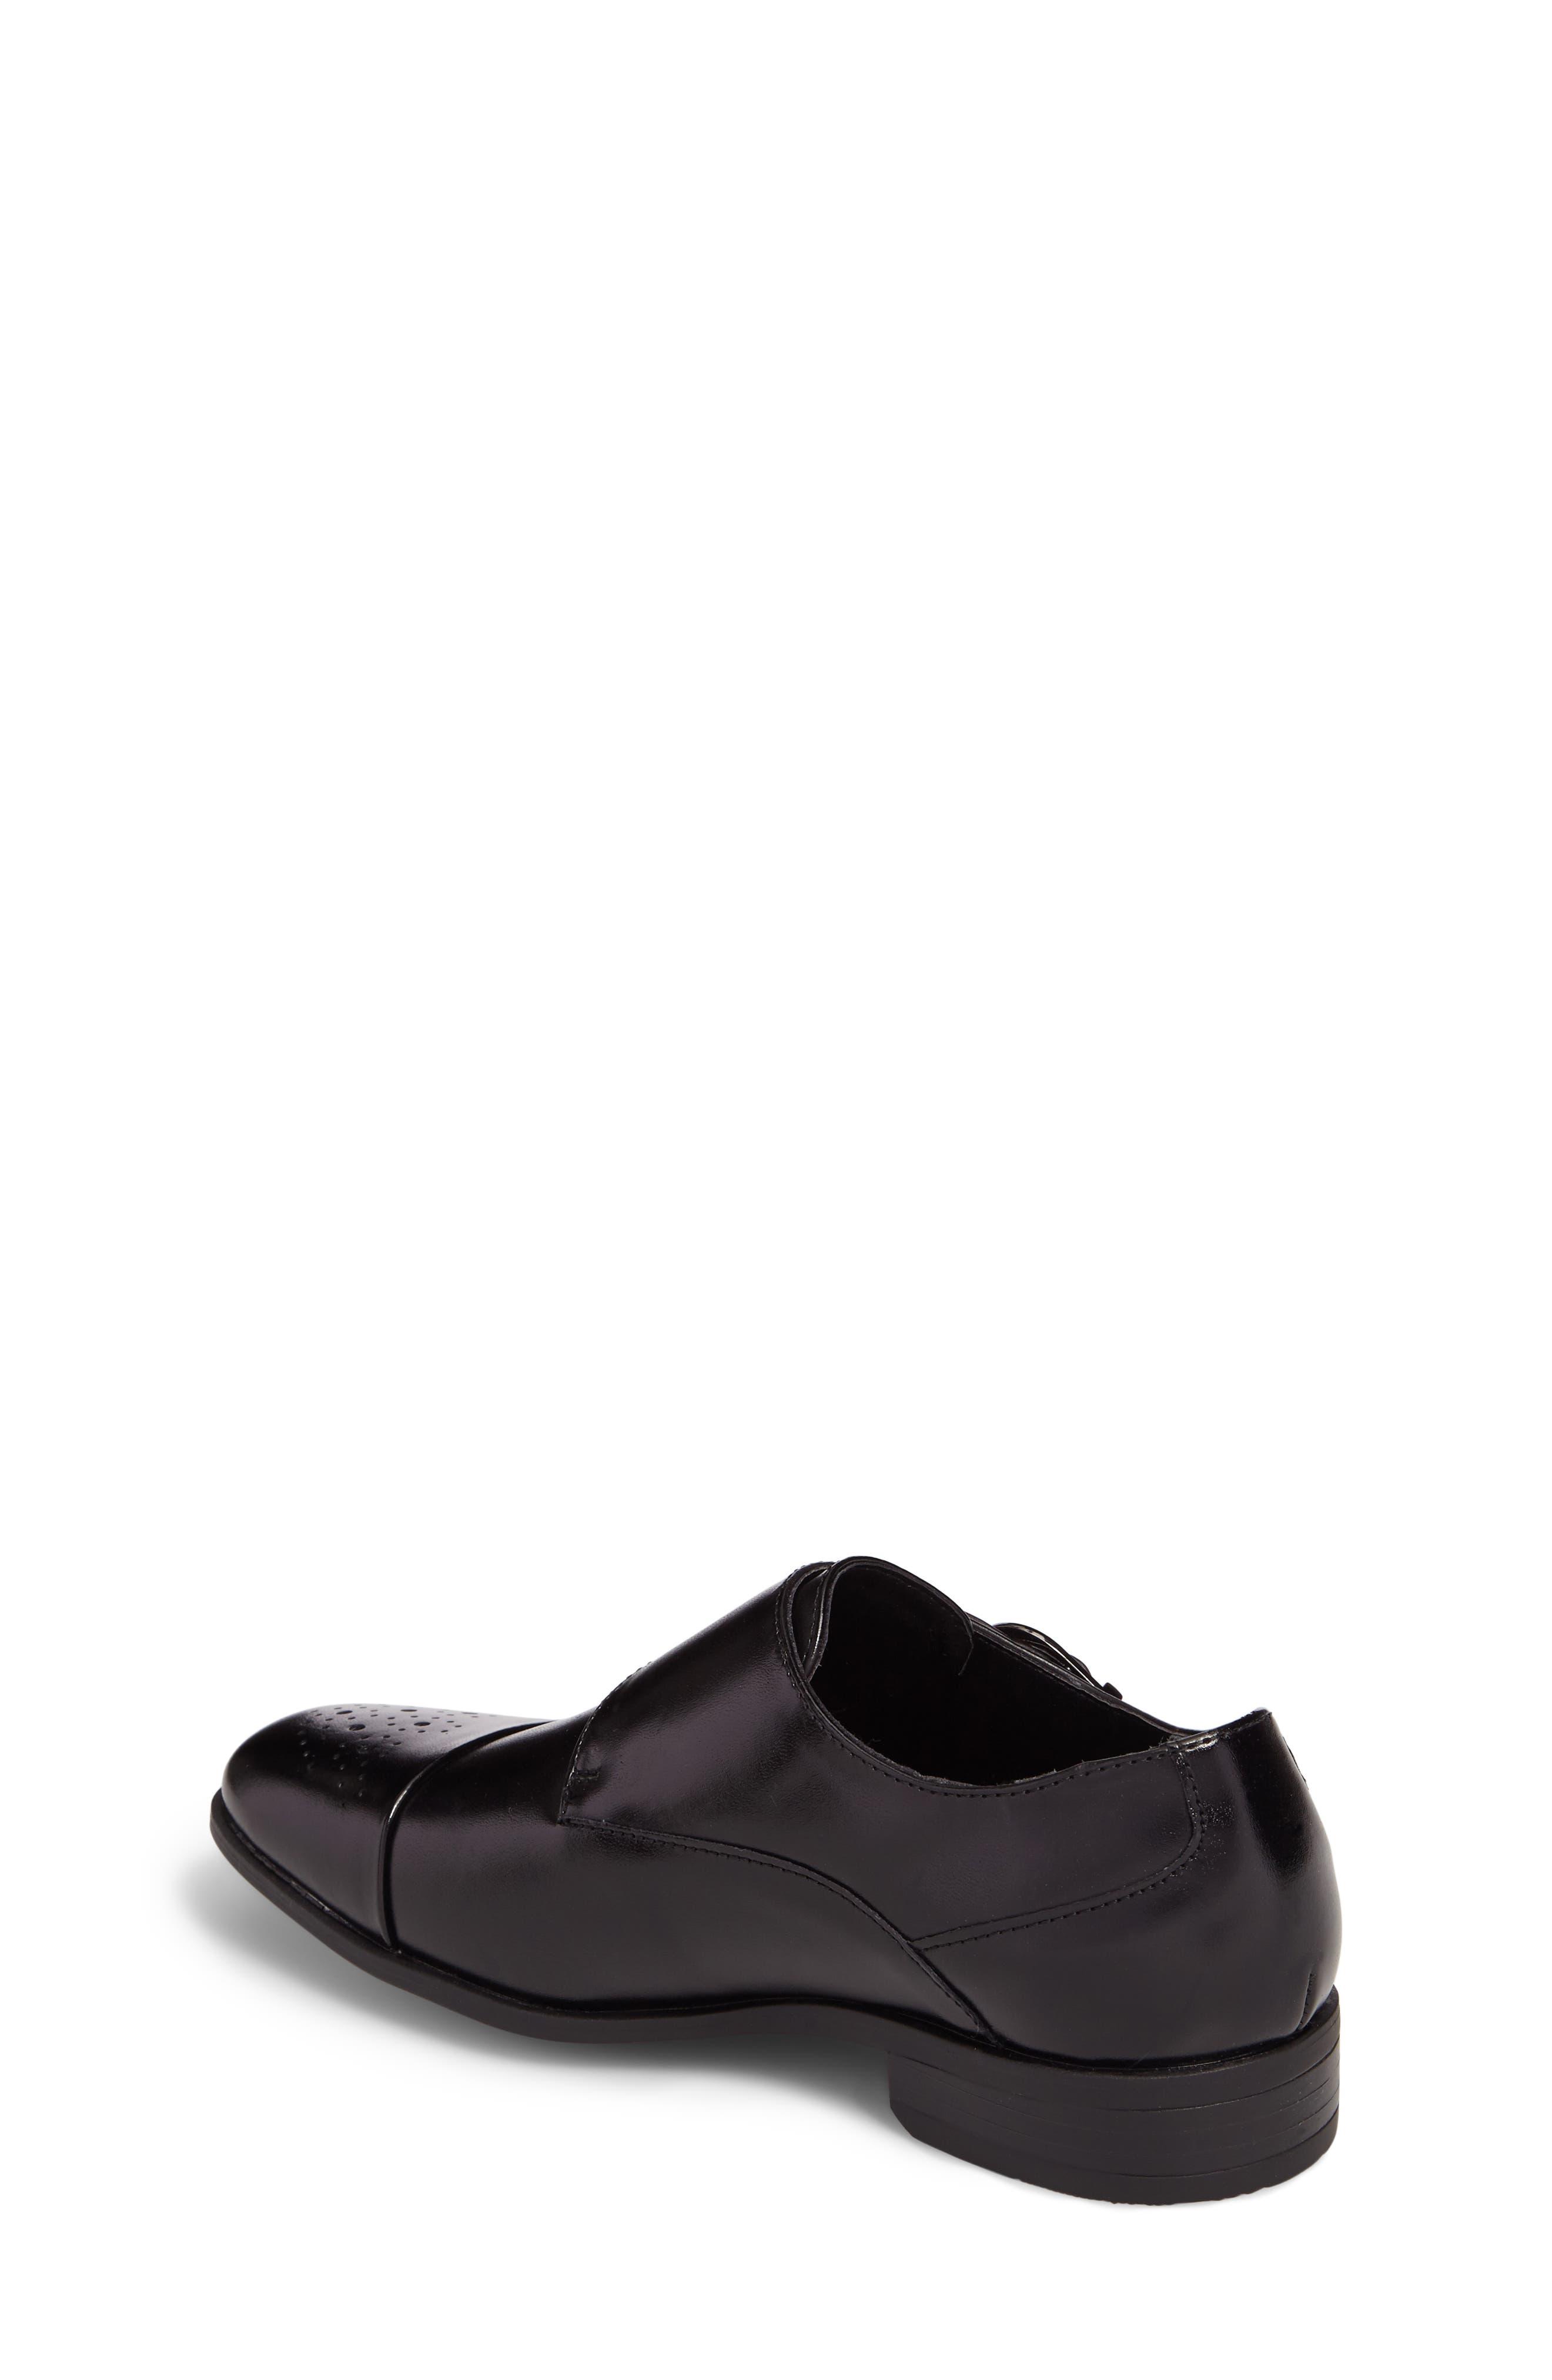 Trevor Cap Toe Monk Shoe,                             Alternate thumbnail 2, color,                             001